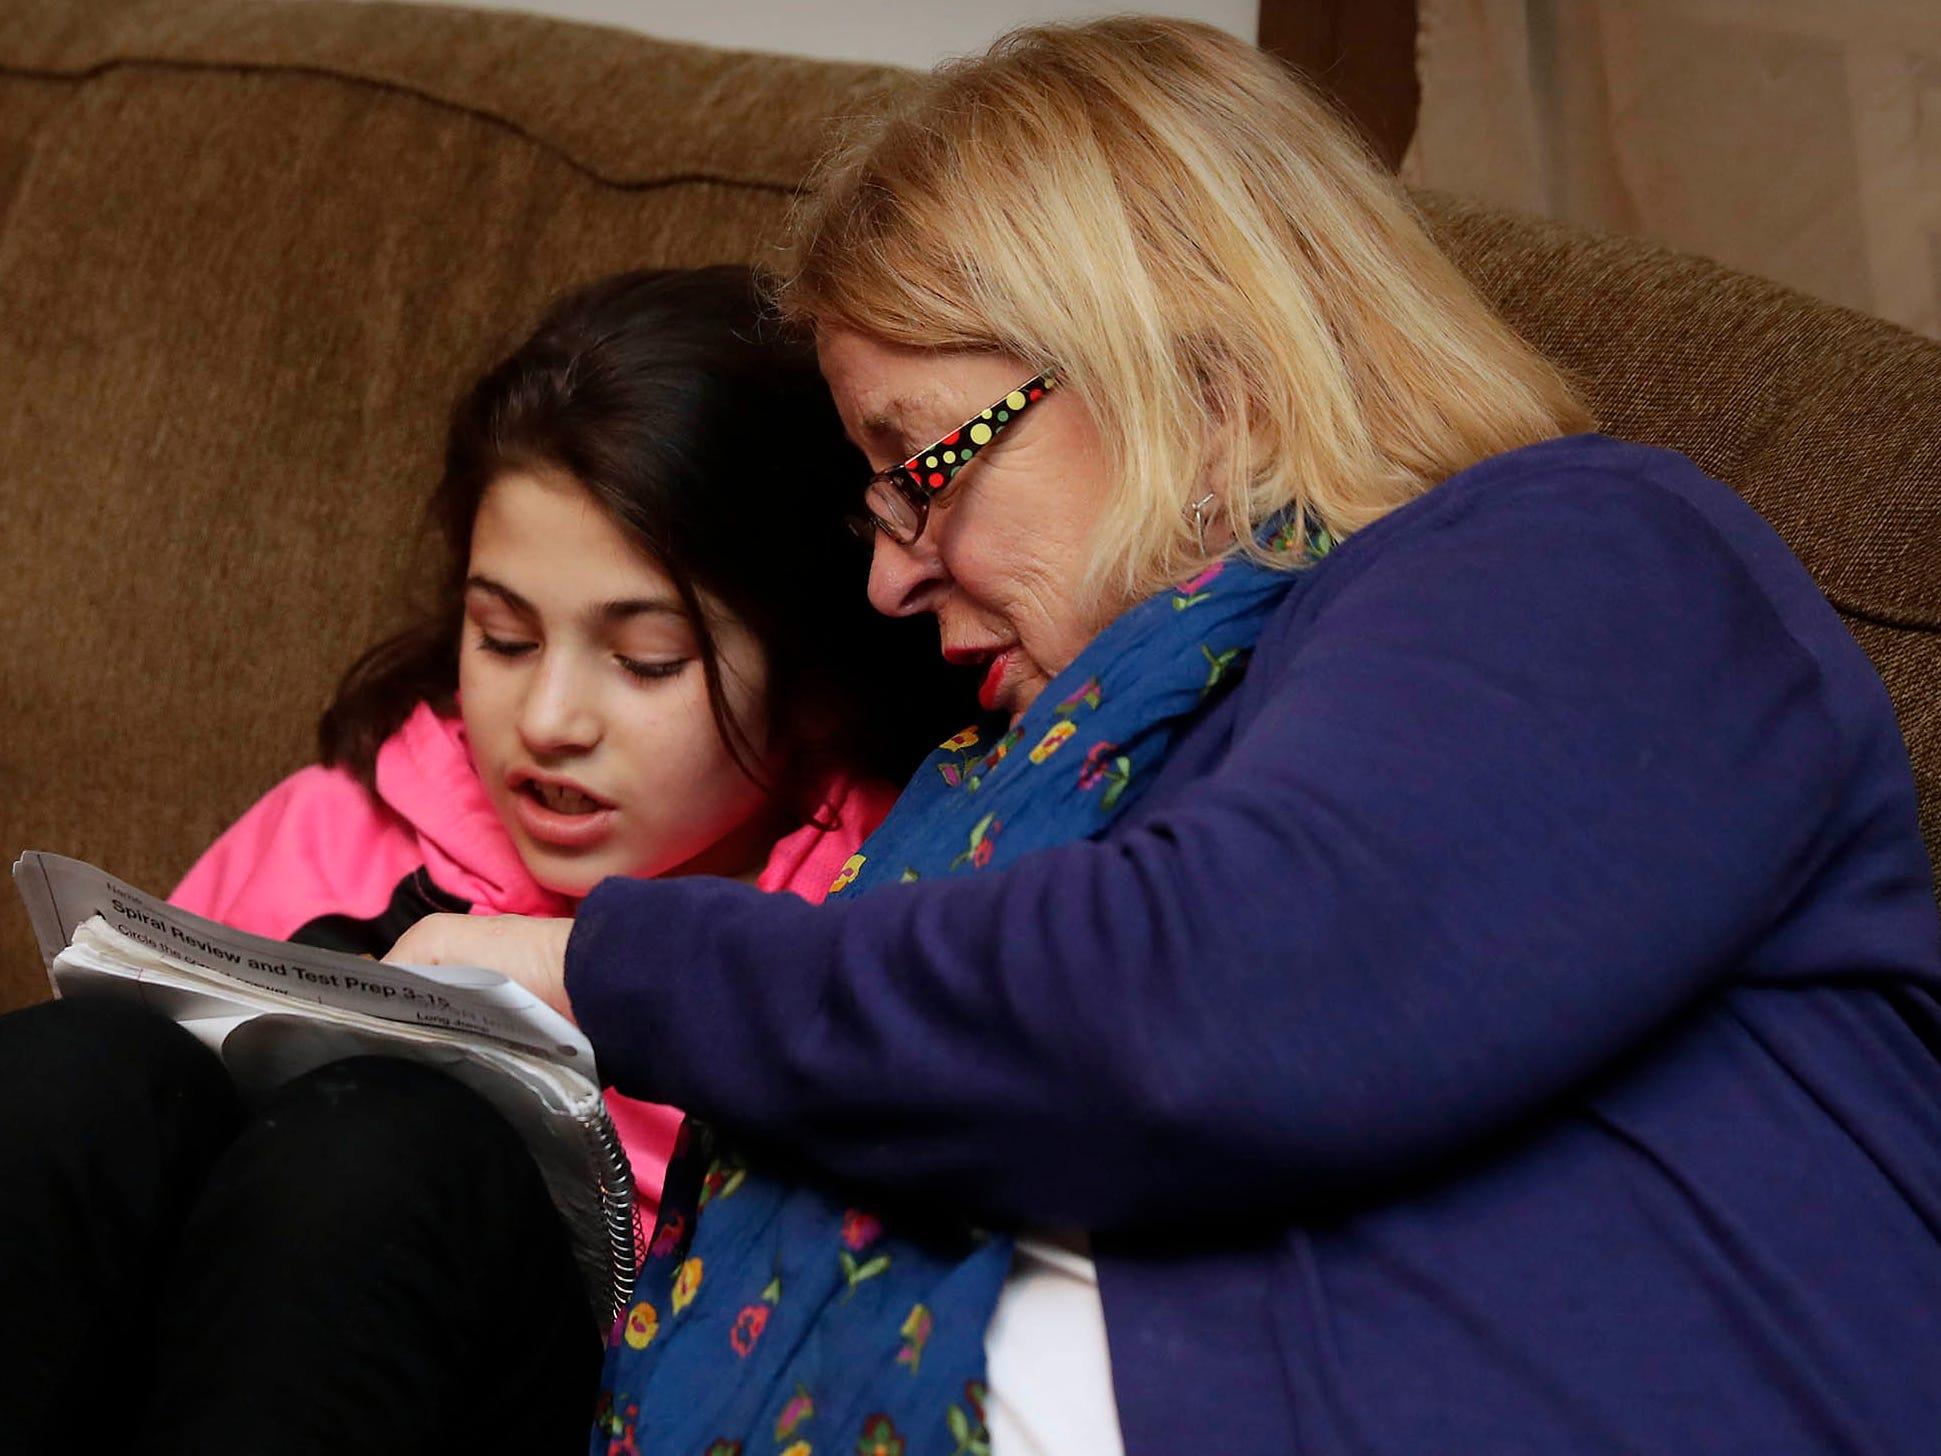 Yasmin Hamdoun, 10, enjoys reading with Anne Catalane.